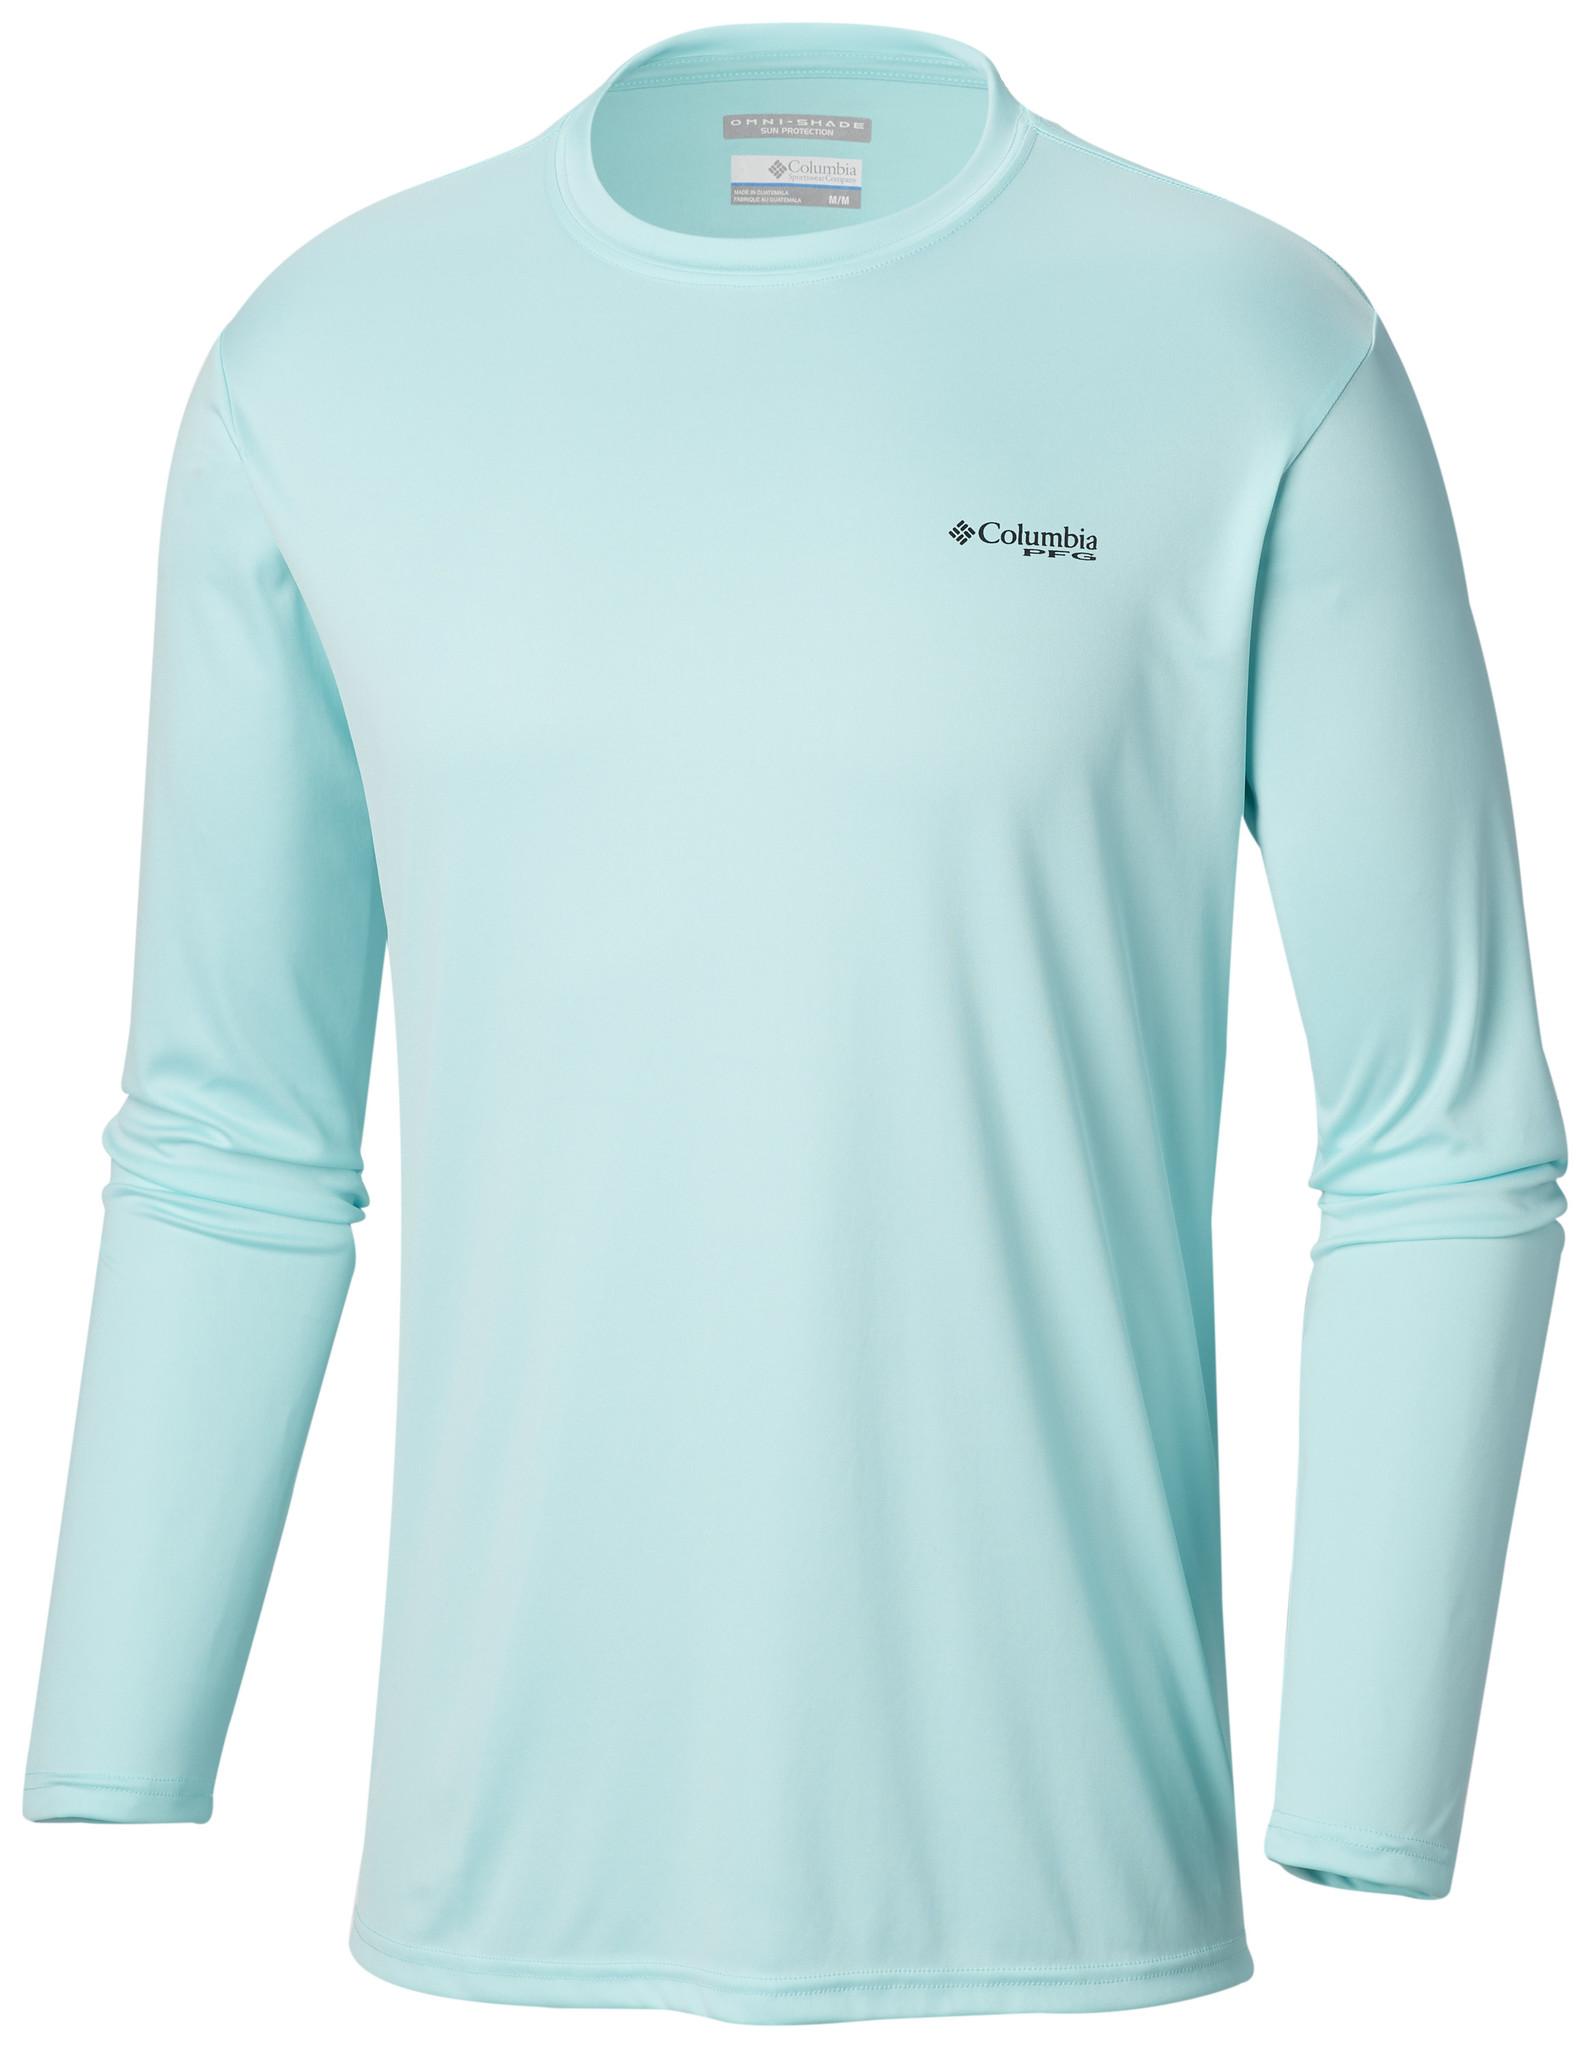 Columbia Sportwear Men's Terminal Tackle PFG Triangle Flag™ Long Sleeve Shirt